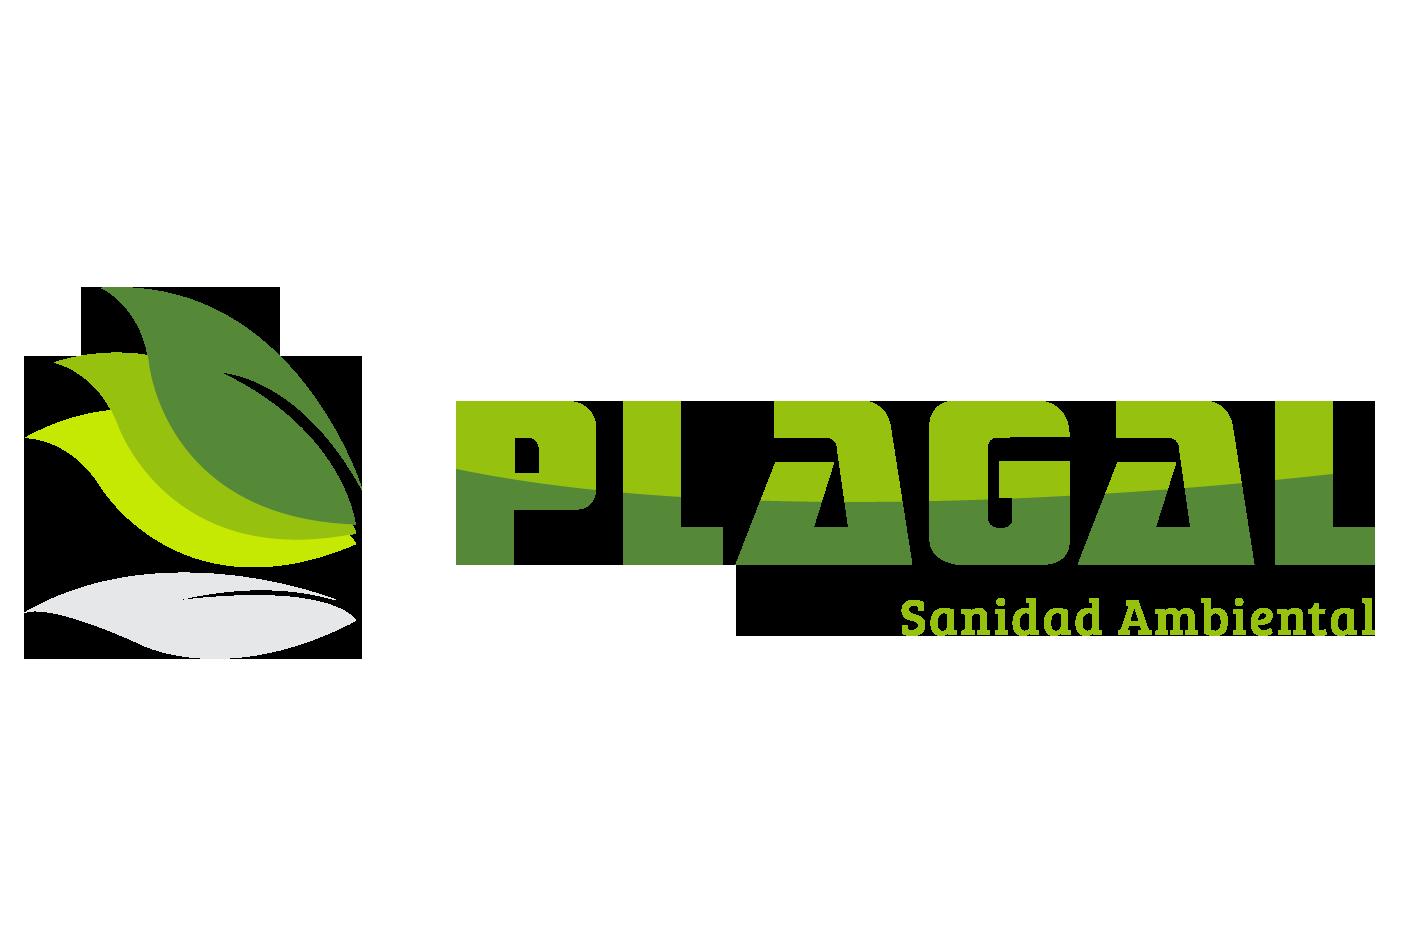 PLAGAL